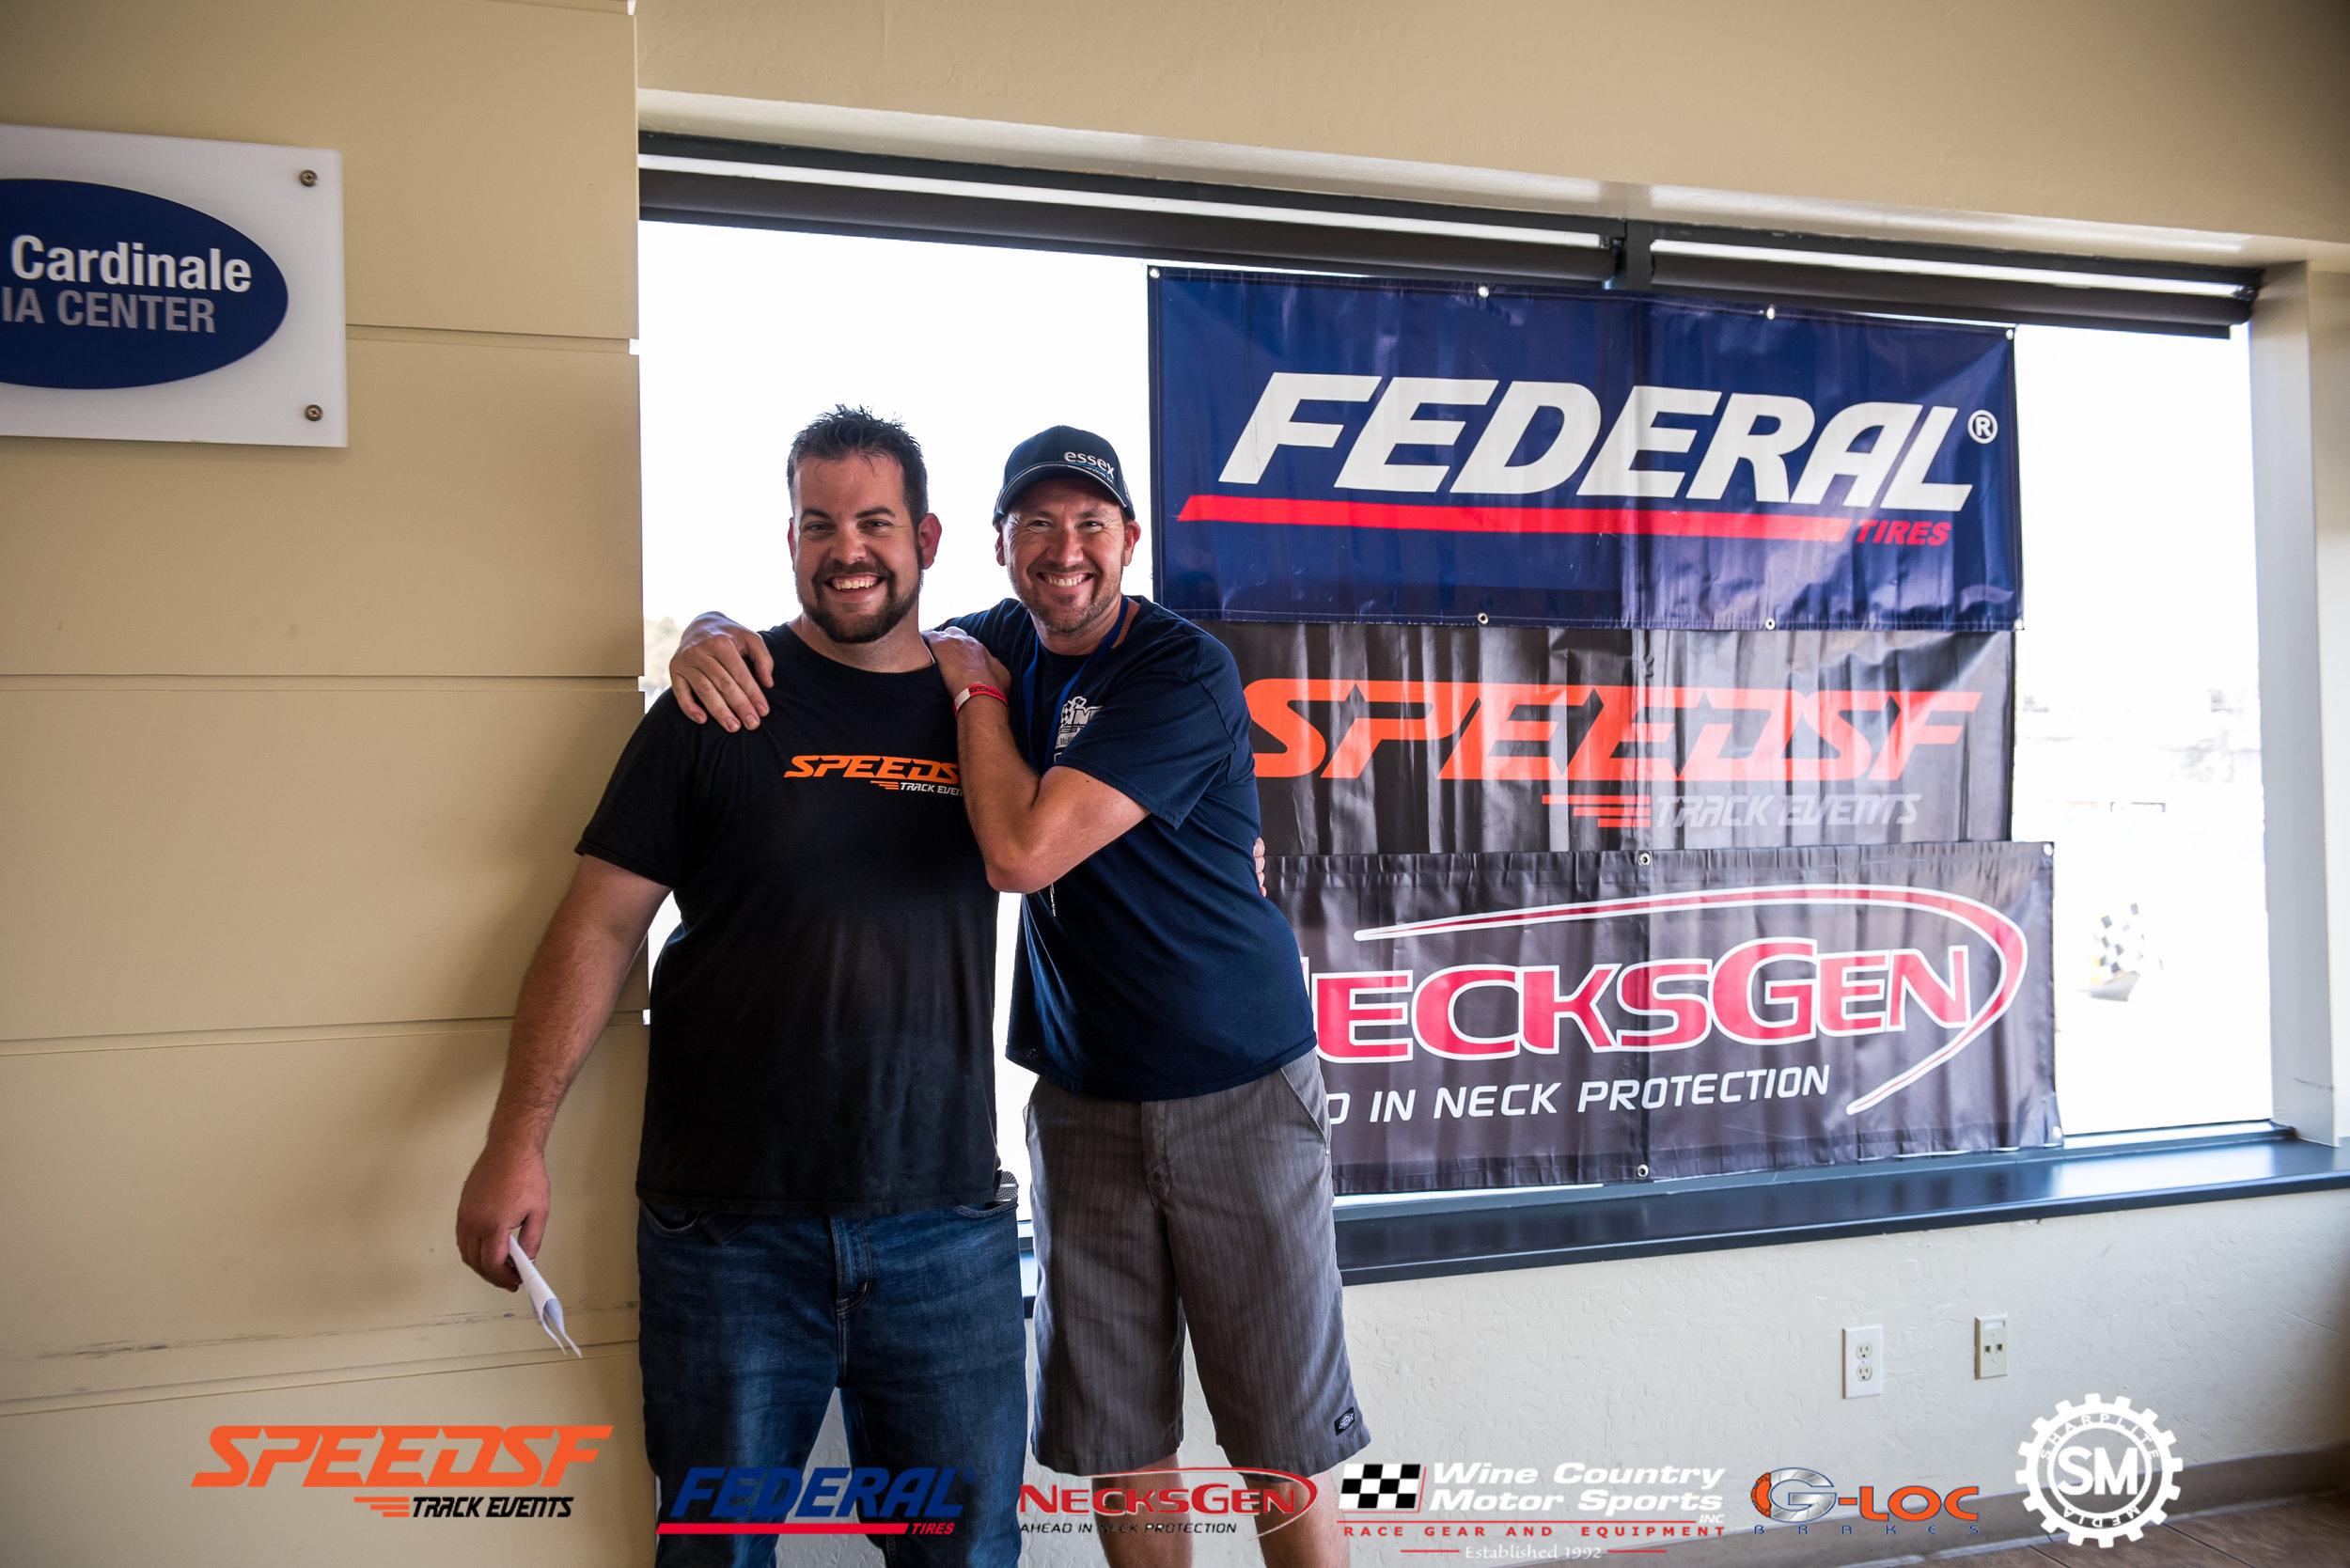 Sonoma Raceway_Monday_SpeedSF_PADDOCK-34.jpg